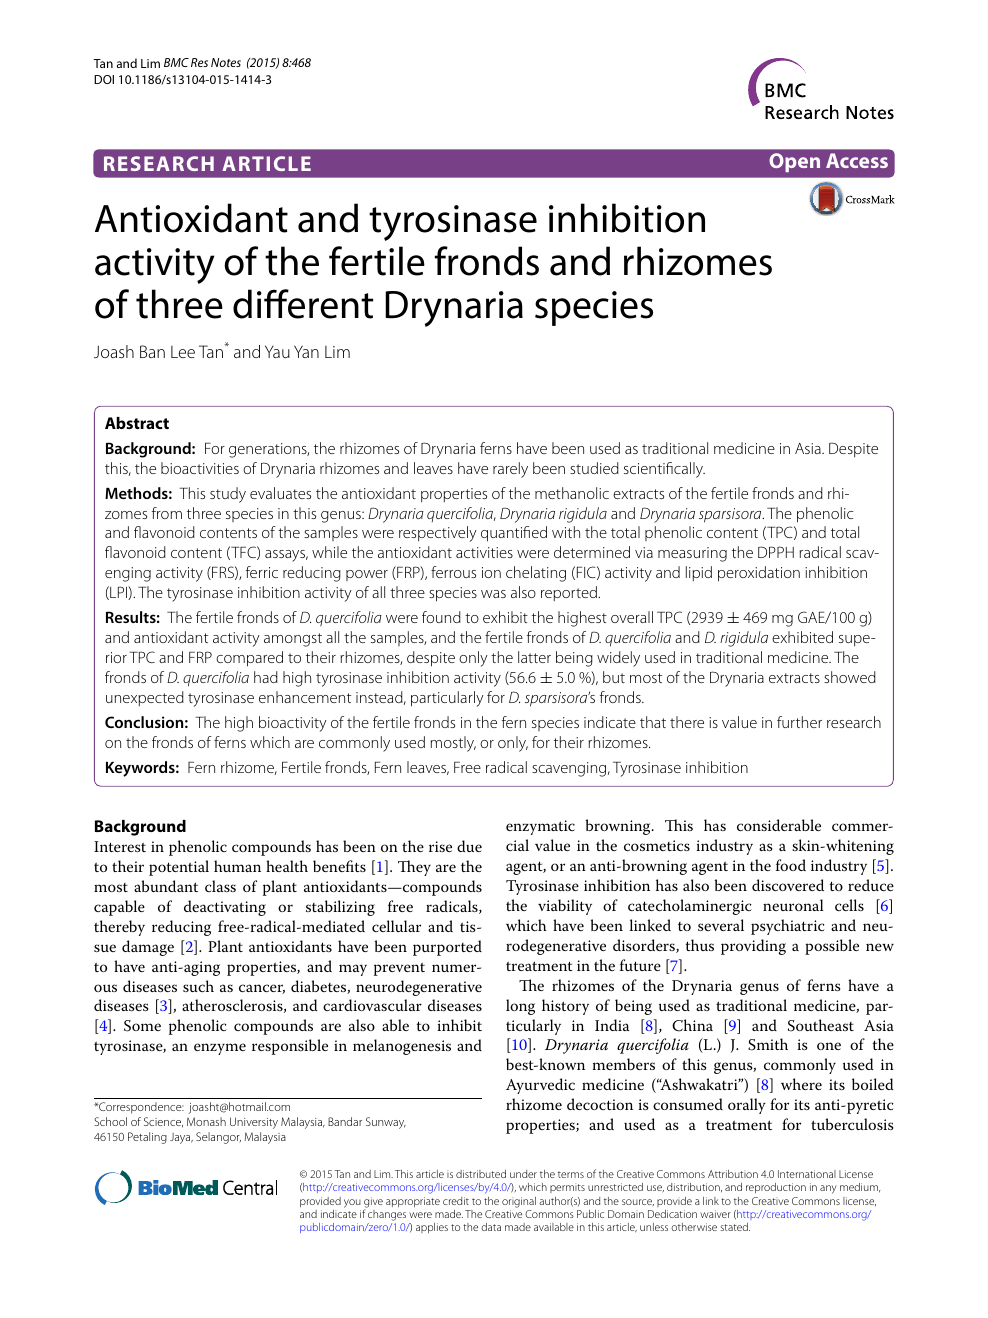 Antioxidant and tyrosinase inhibition activity of the fertile fronds